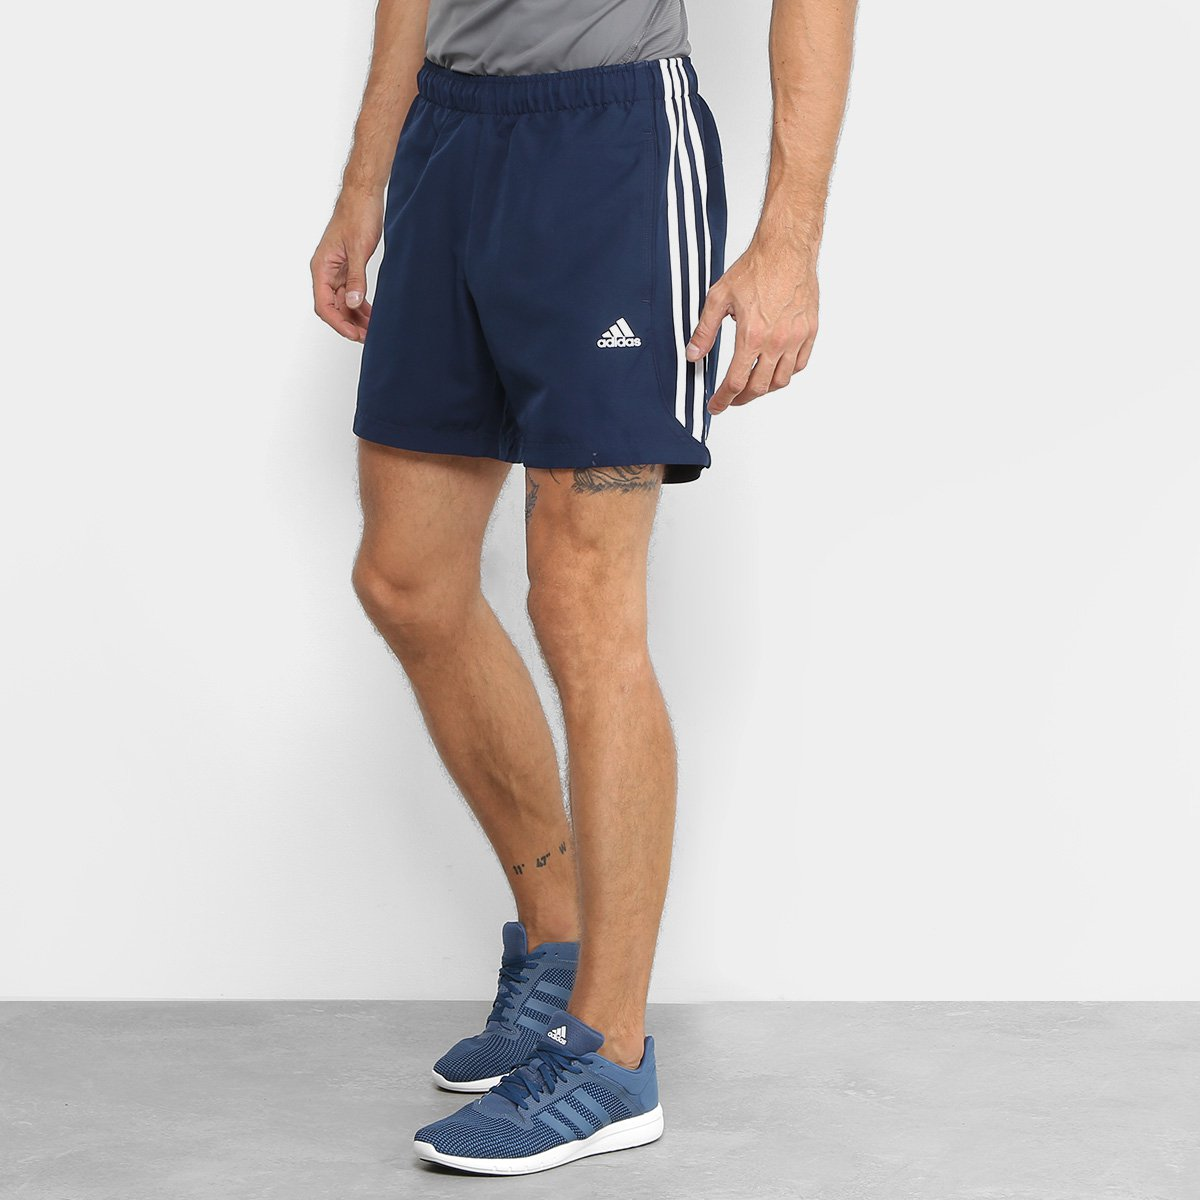 224cd4940 Bermuda Adidas Ess 3S Chelsea Masculina | Allianz Parque Shop